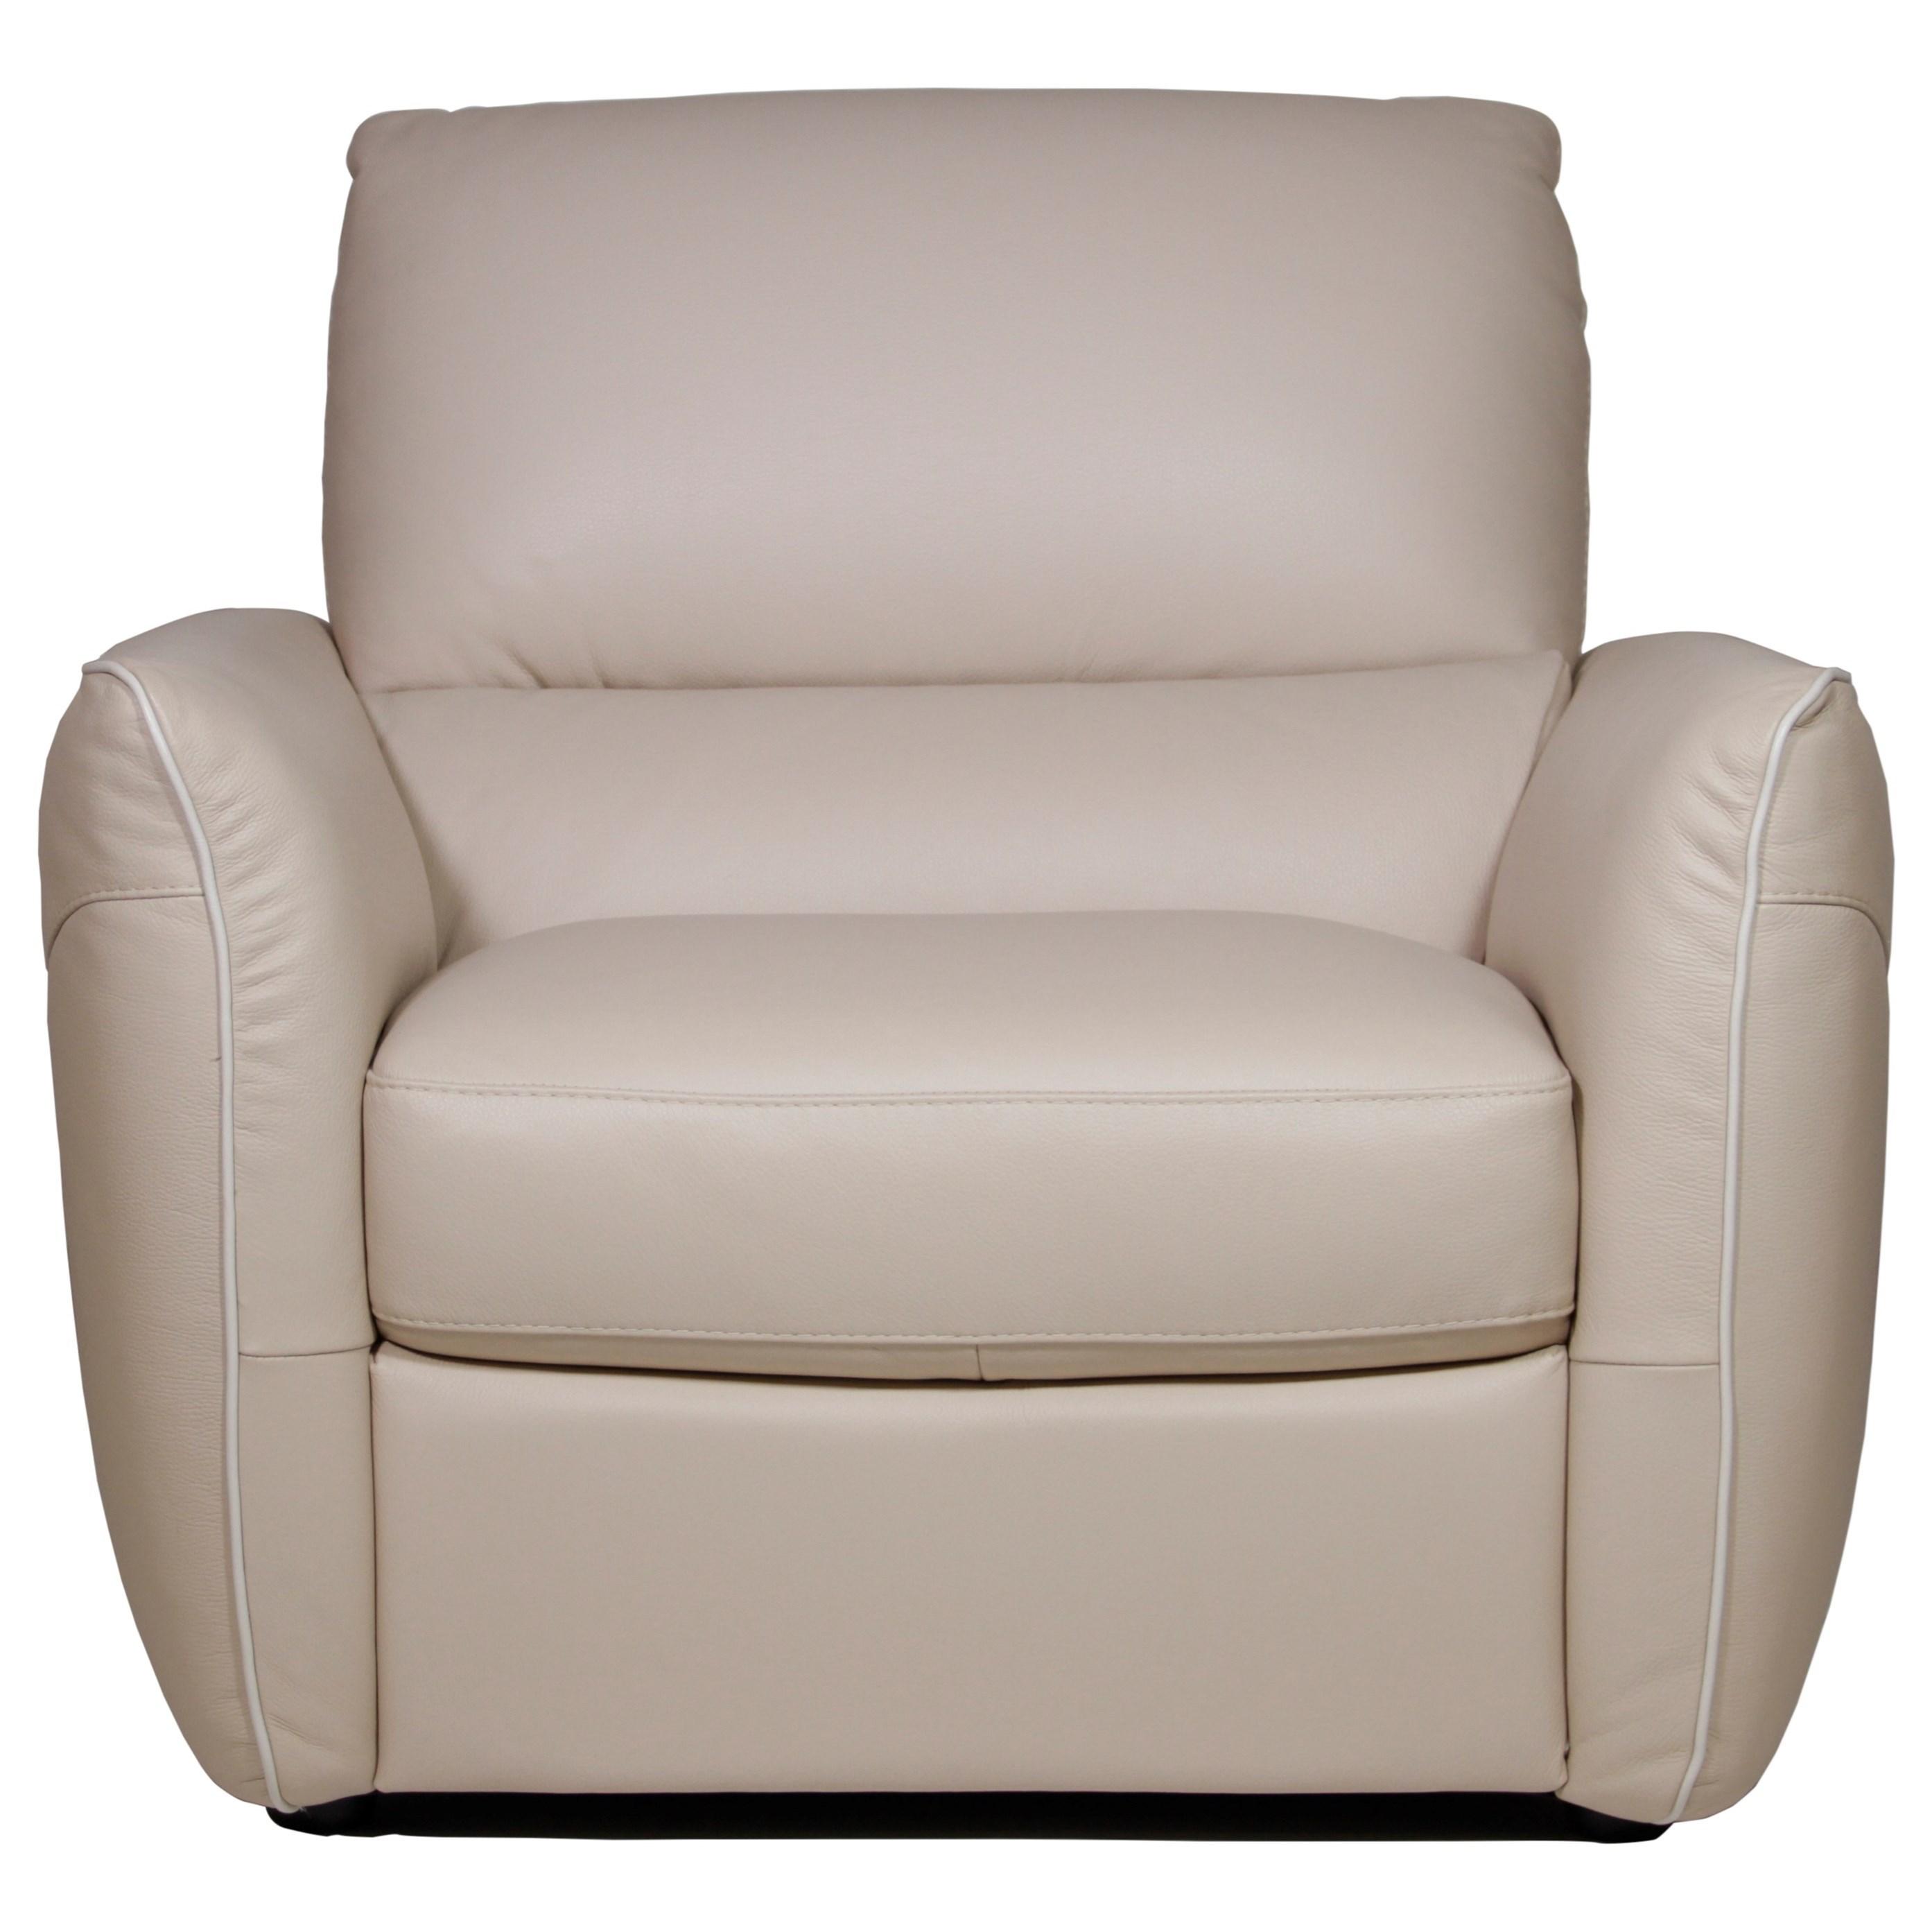 Natuzzi Editions Azzura Chair - Item Number: B842-003-10BG